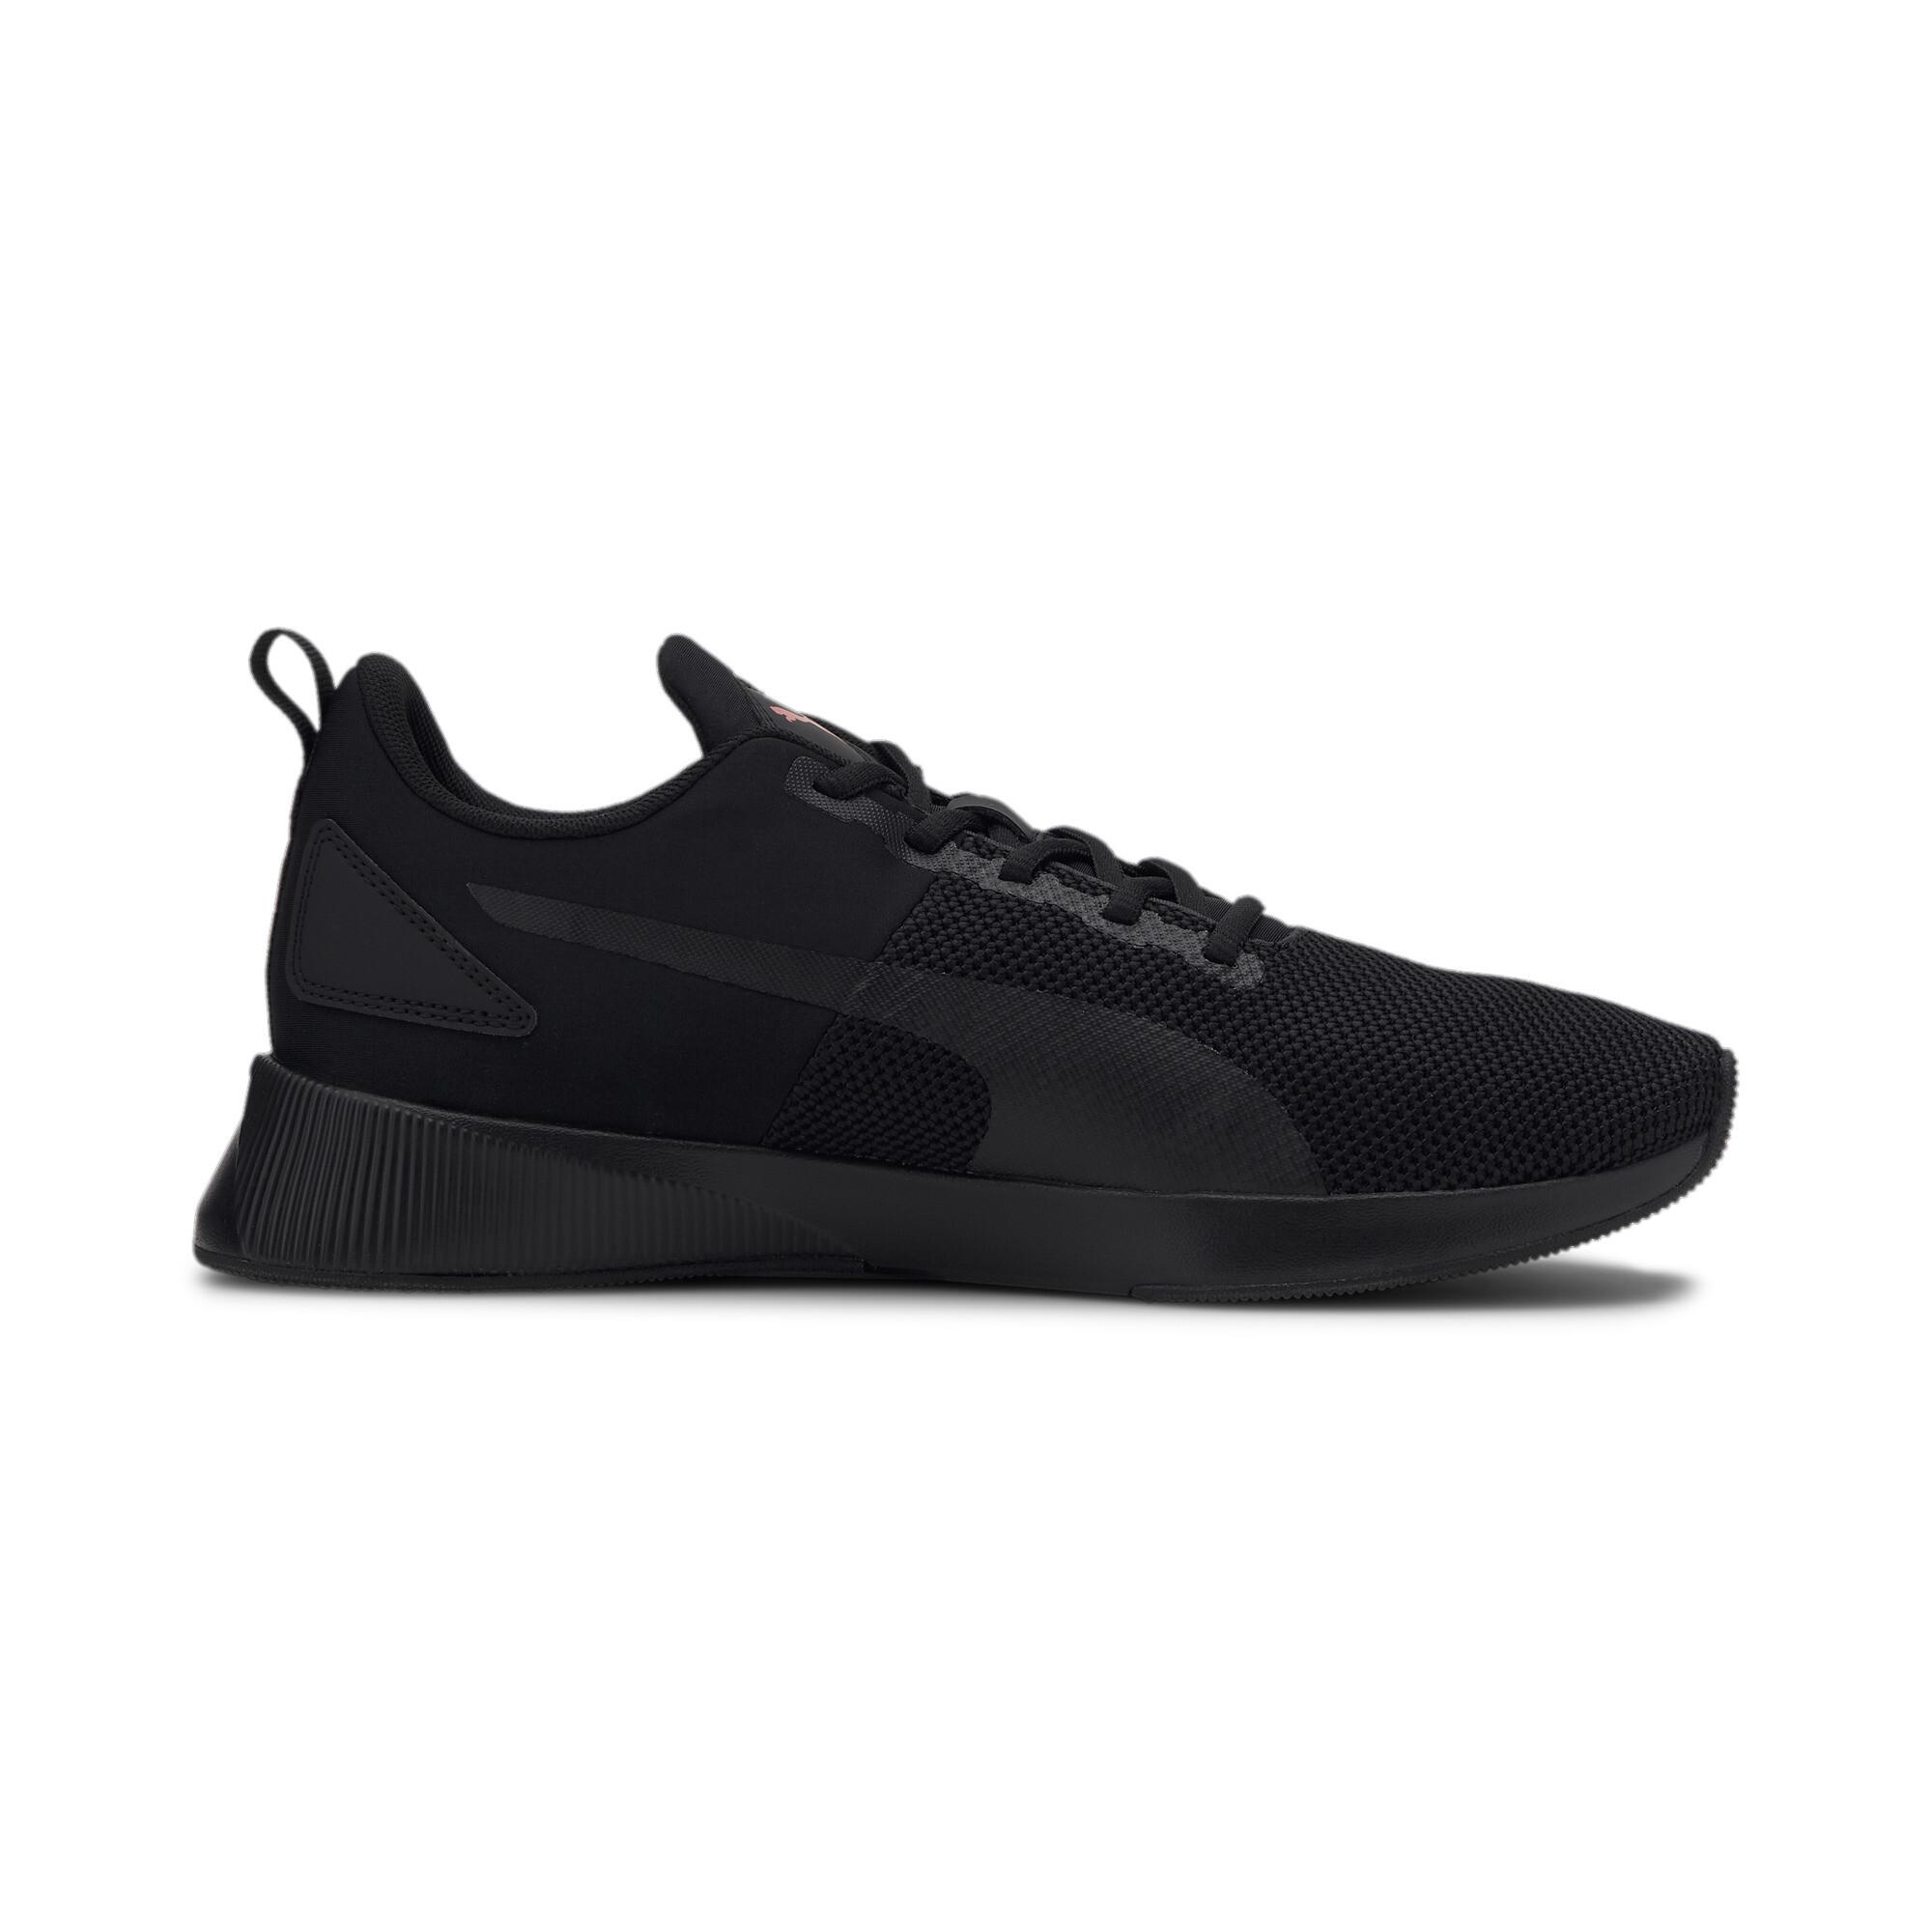 PUMA-Flyer-Runner-Running-Shoes-Mens-Shoe-Running thumbnail 31